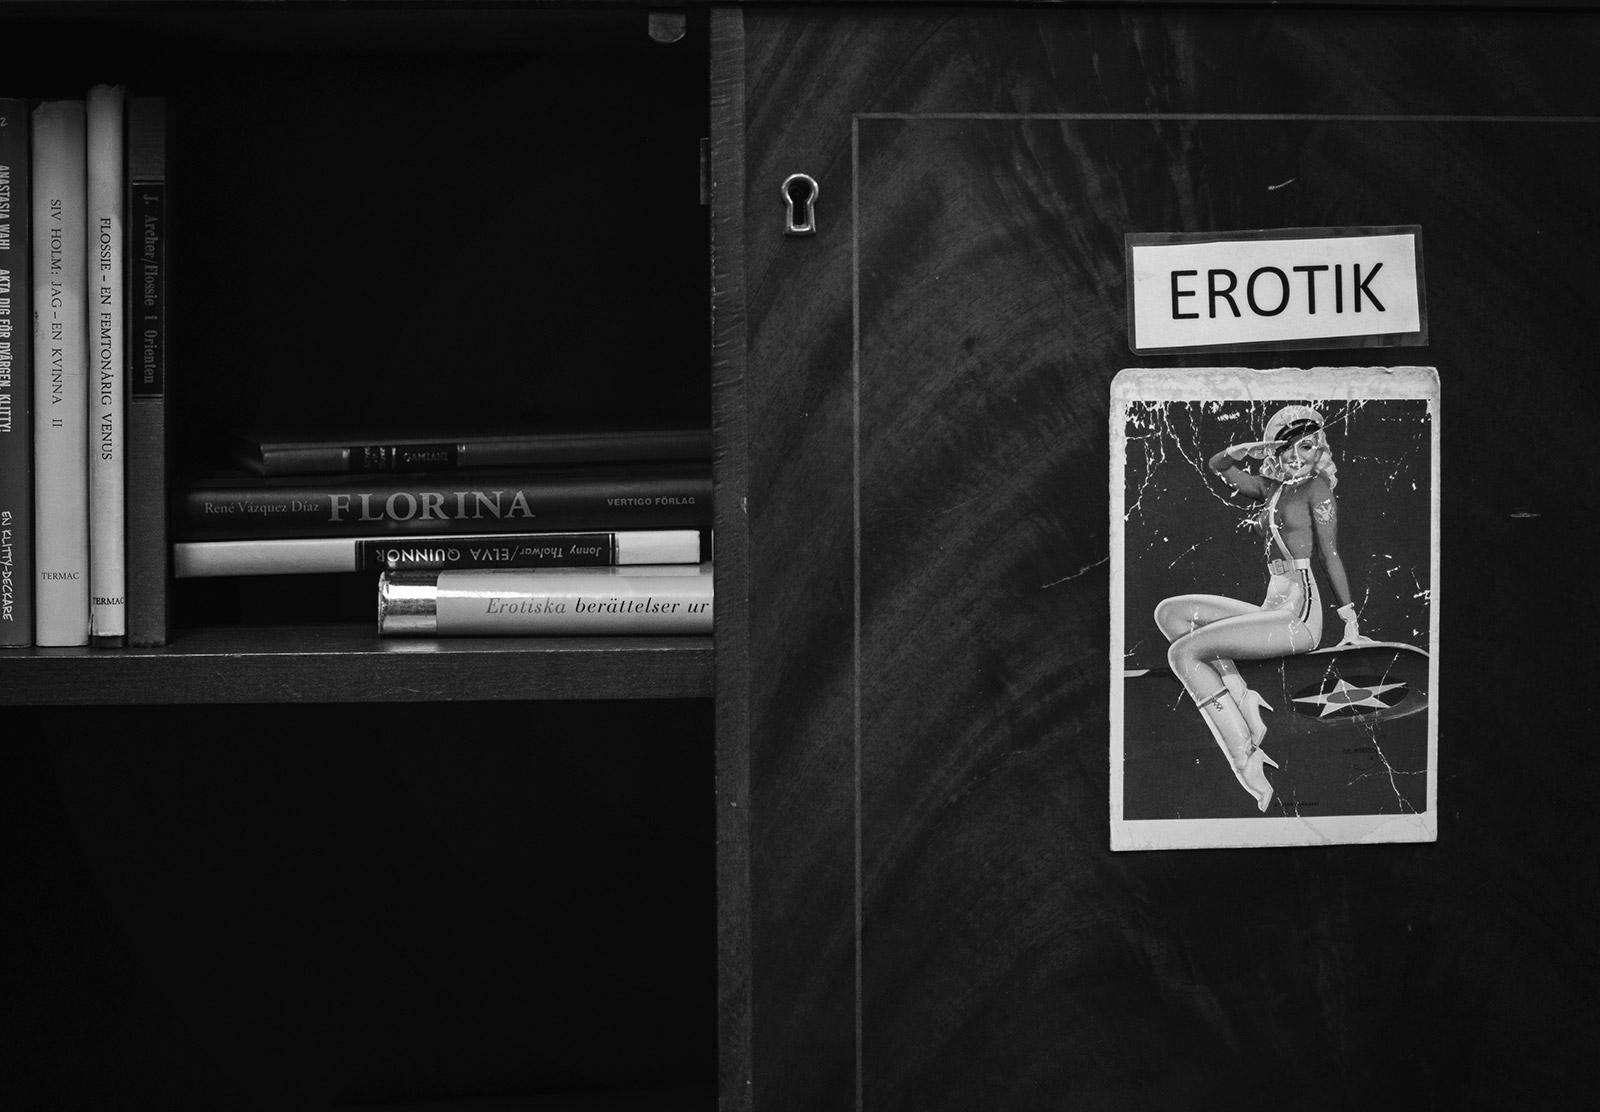 Erotic sign on cupboard